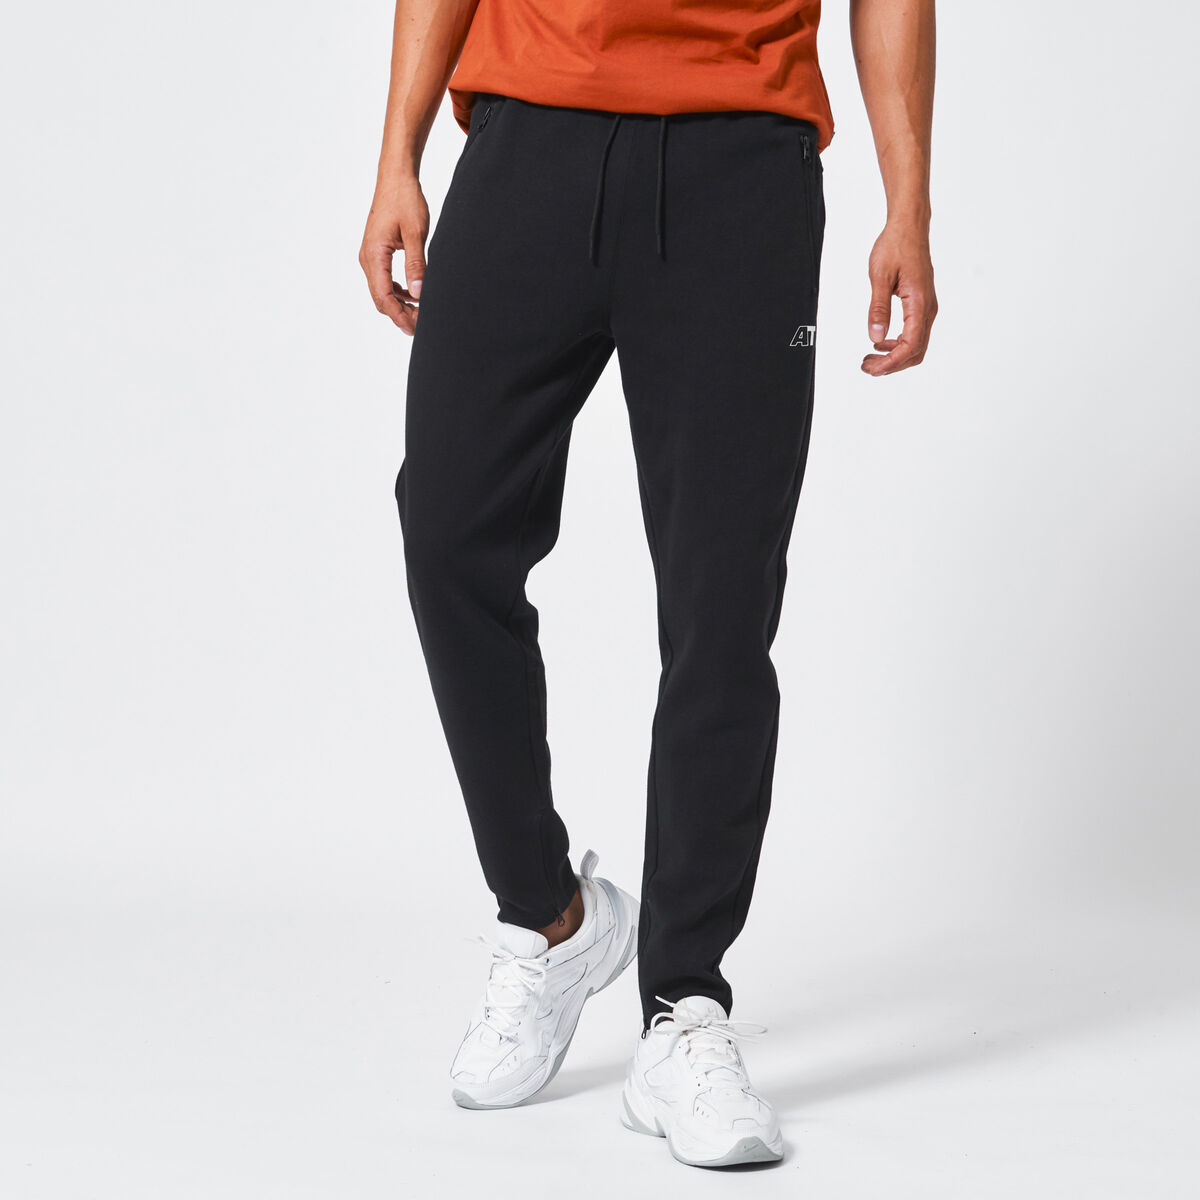 Pantalon de jogging Claude